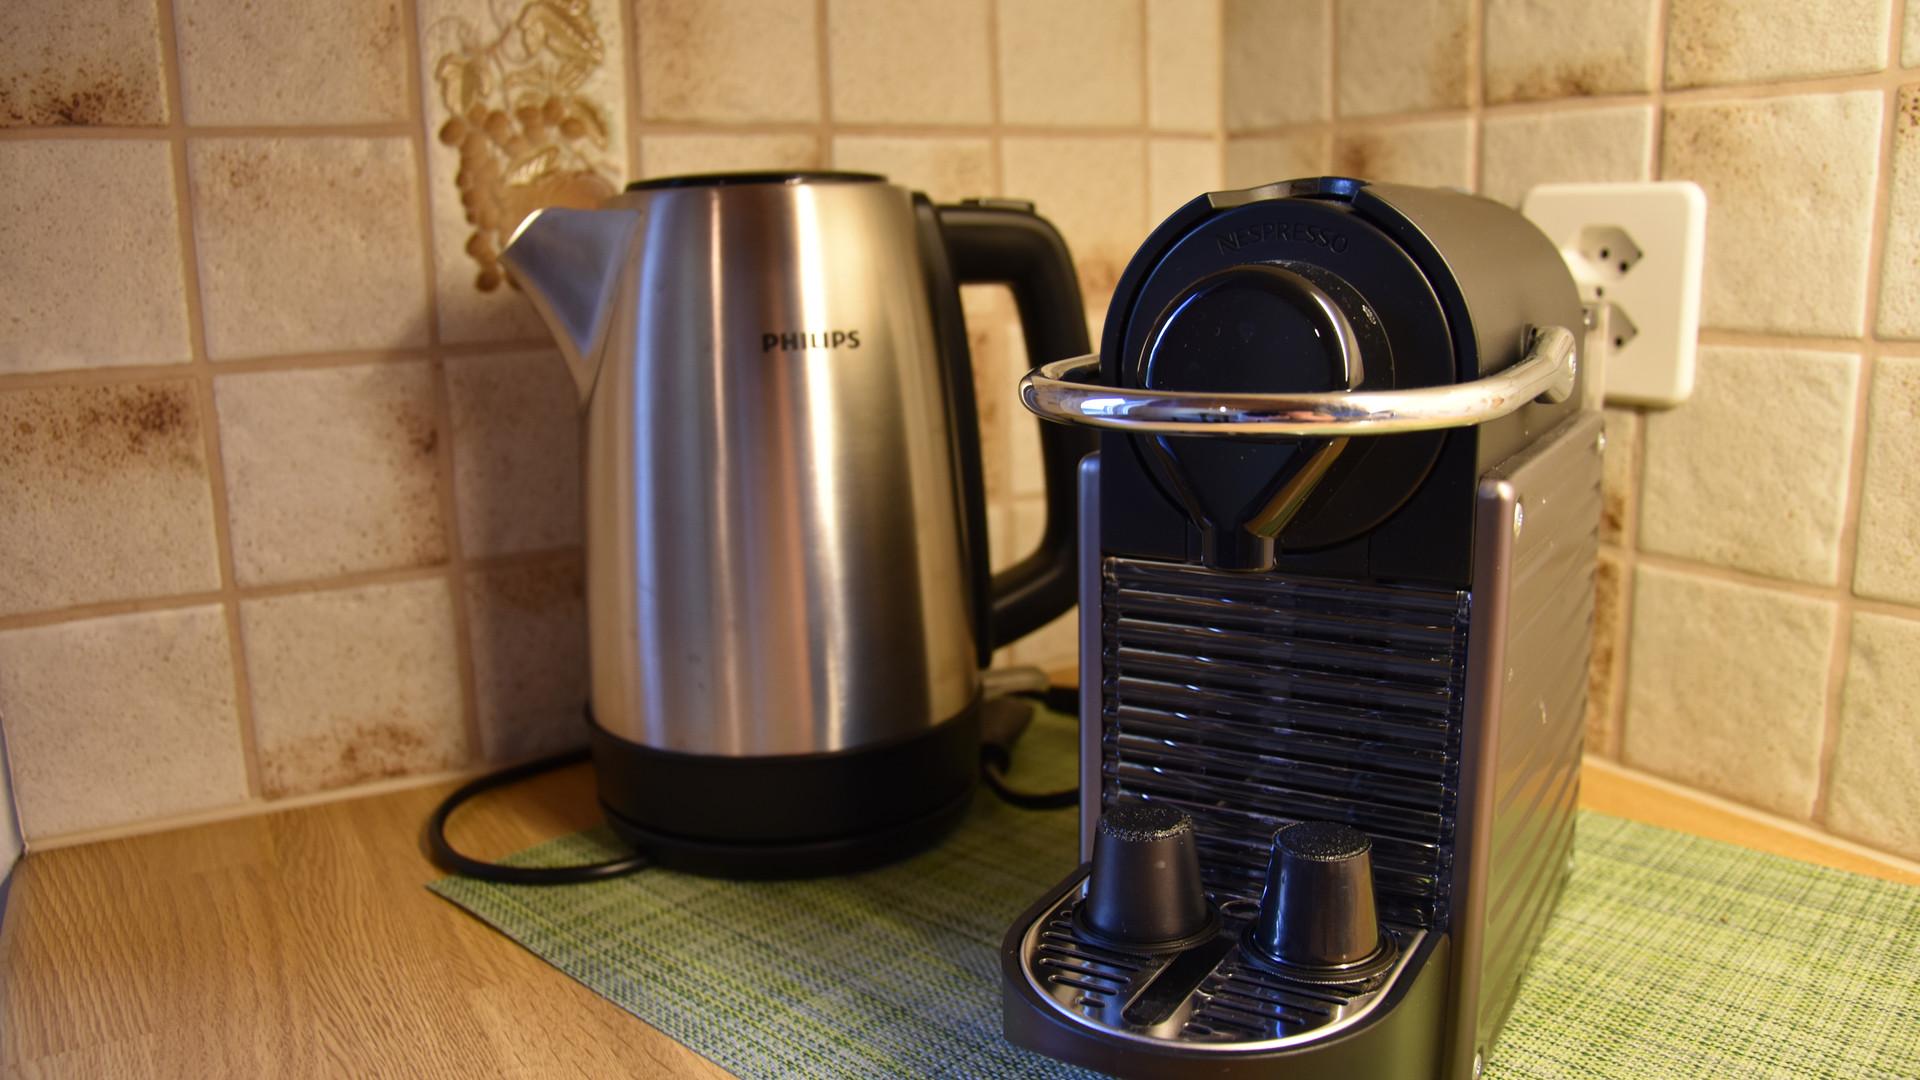 Eiger_Kaffeemaschine.JPG